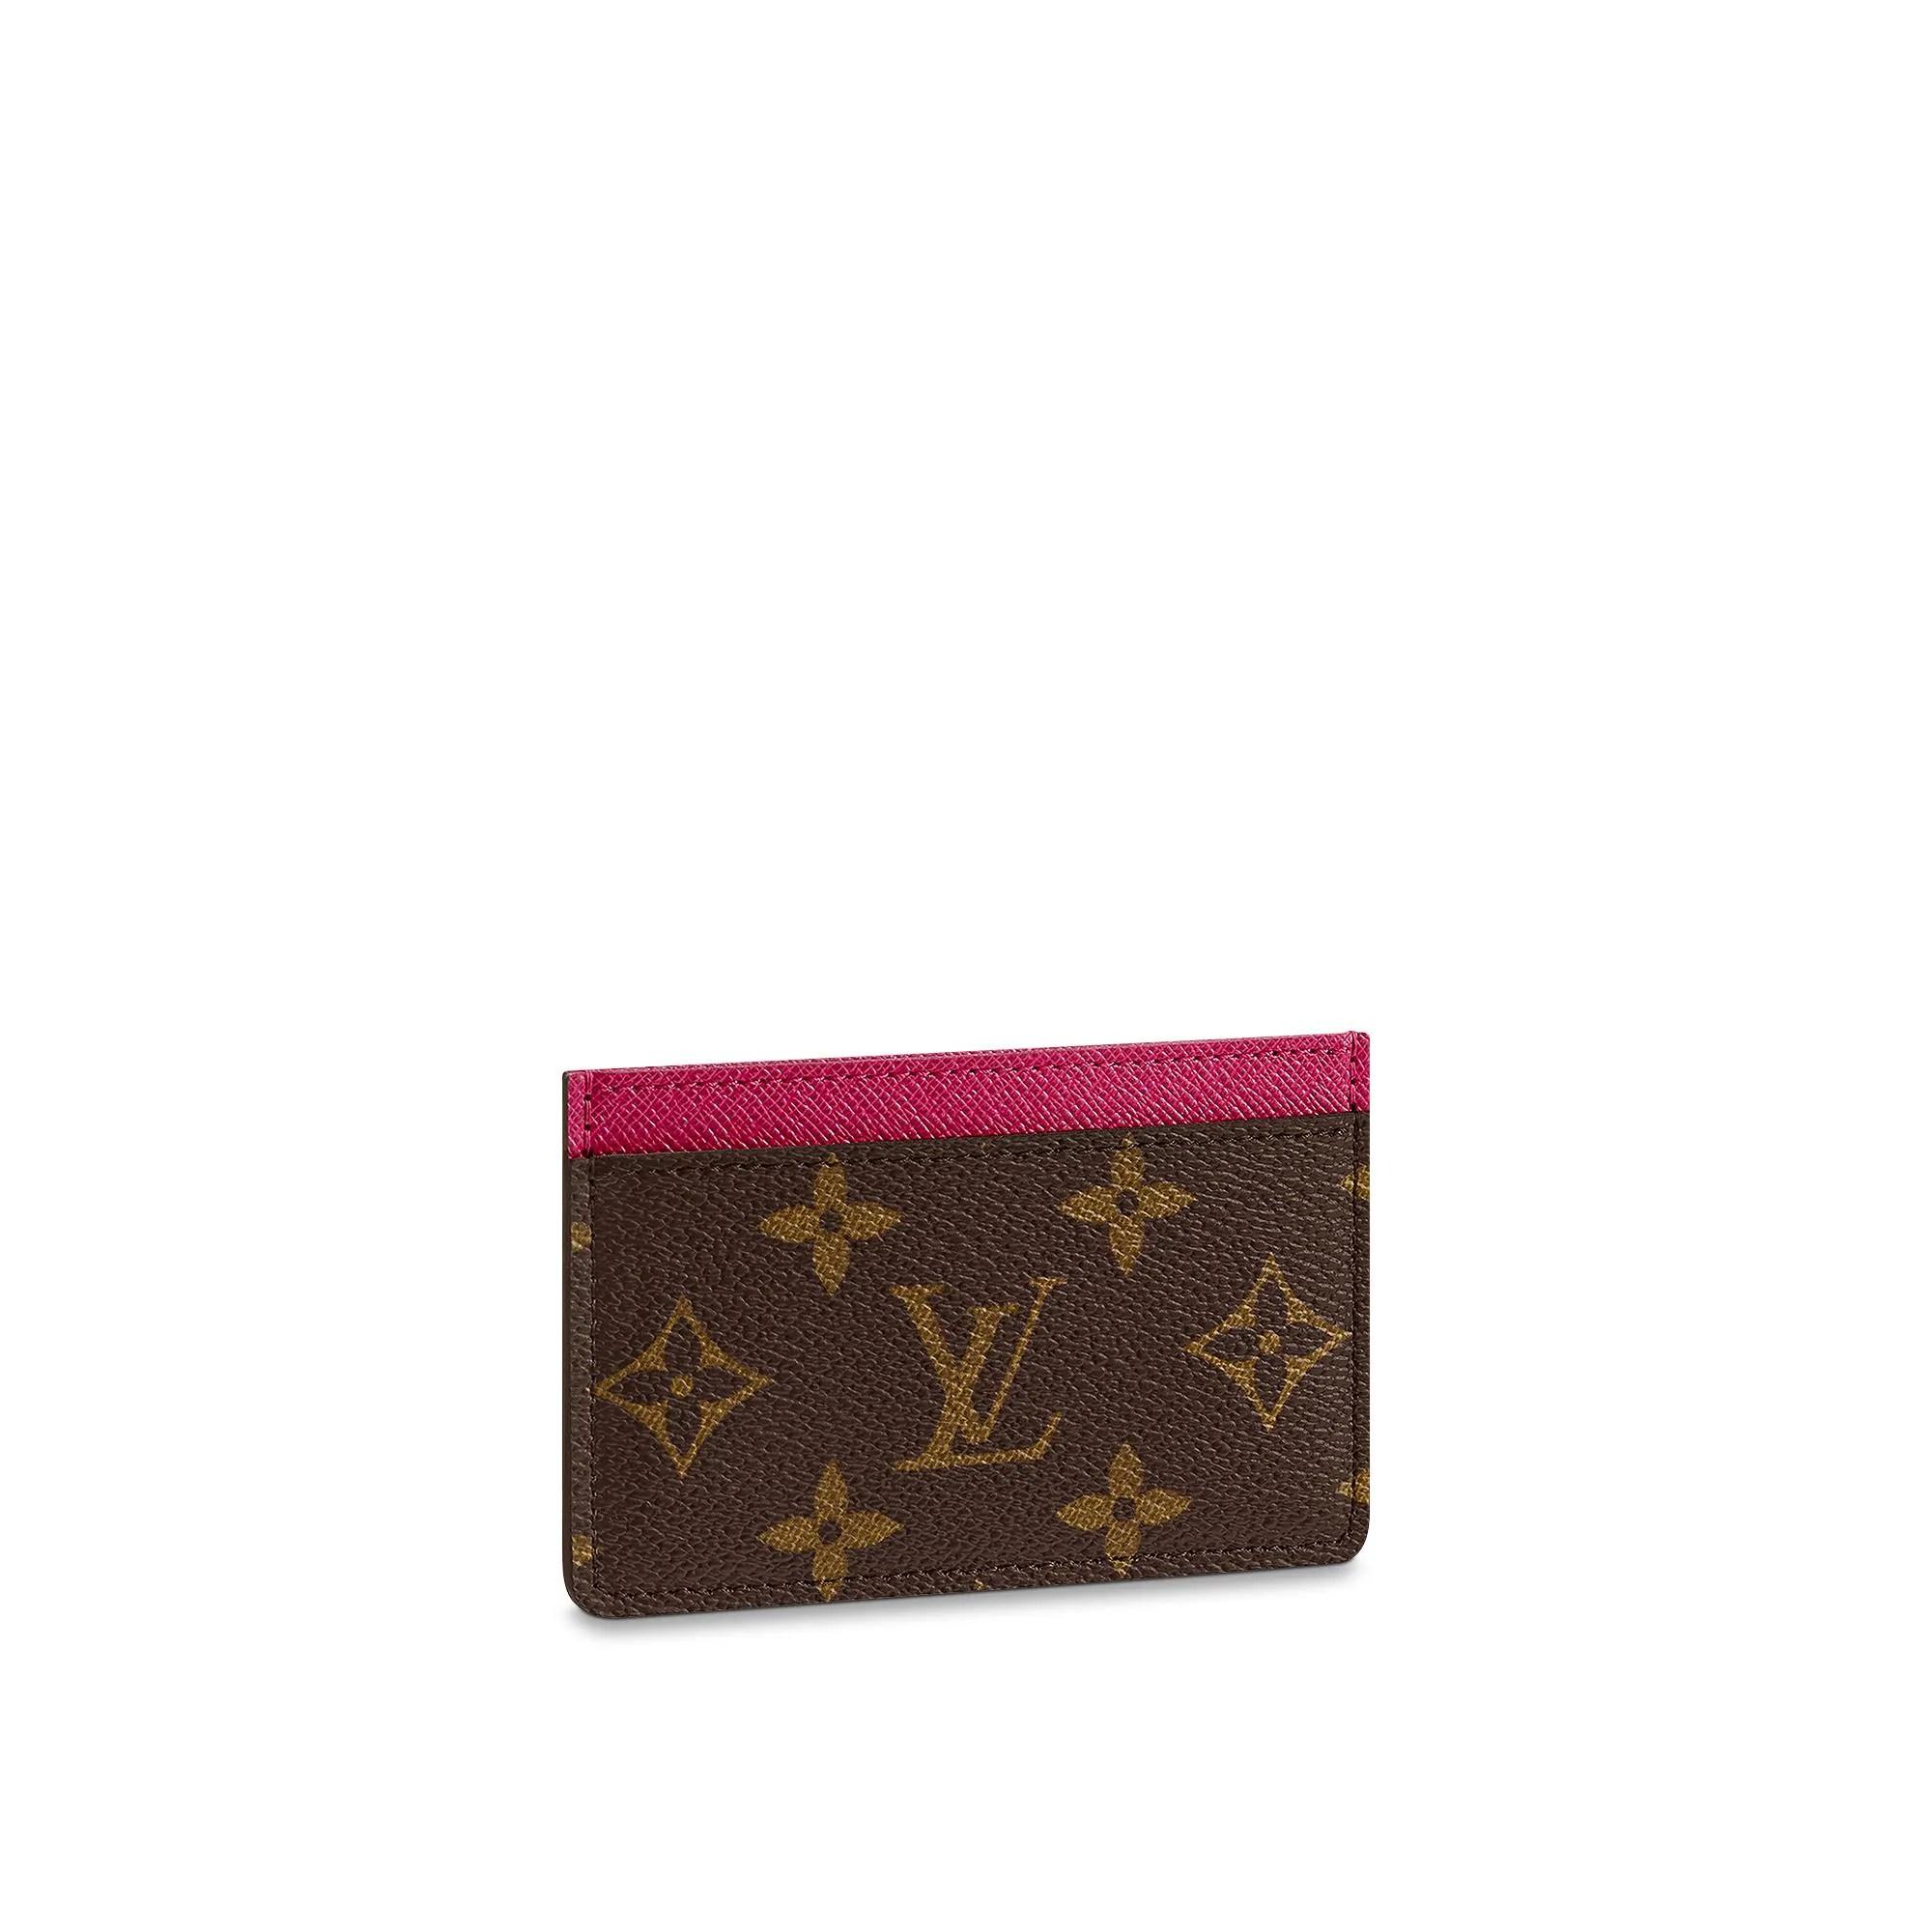 Christmas Small Leather Goods Card Holder Monogram